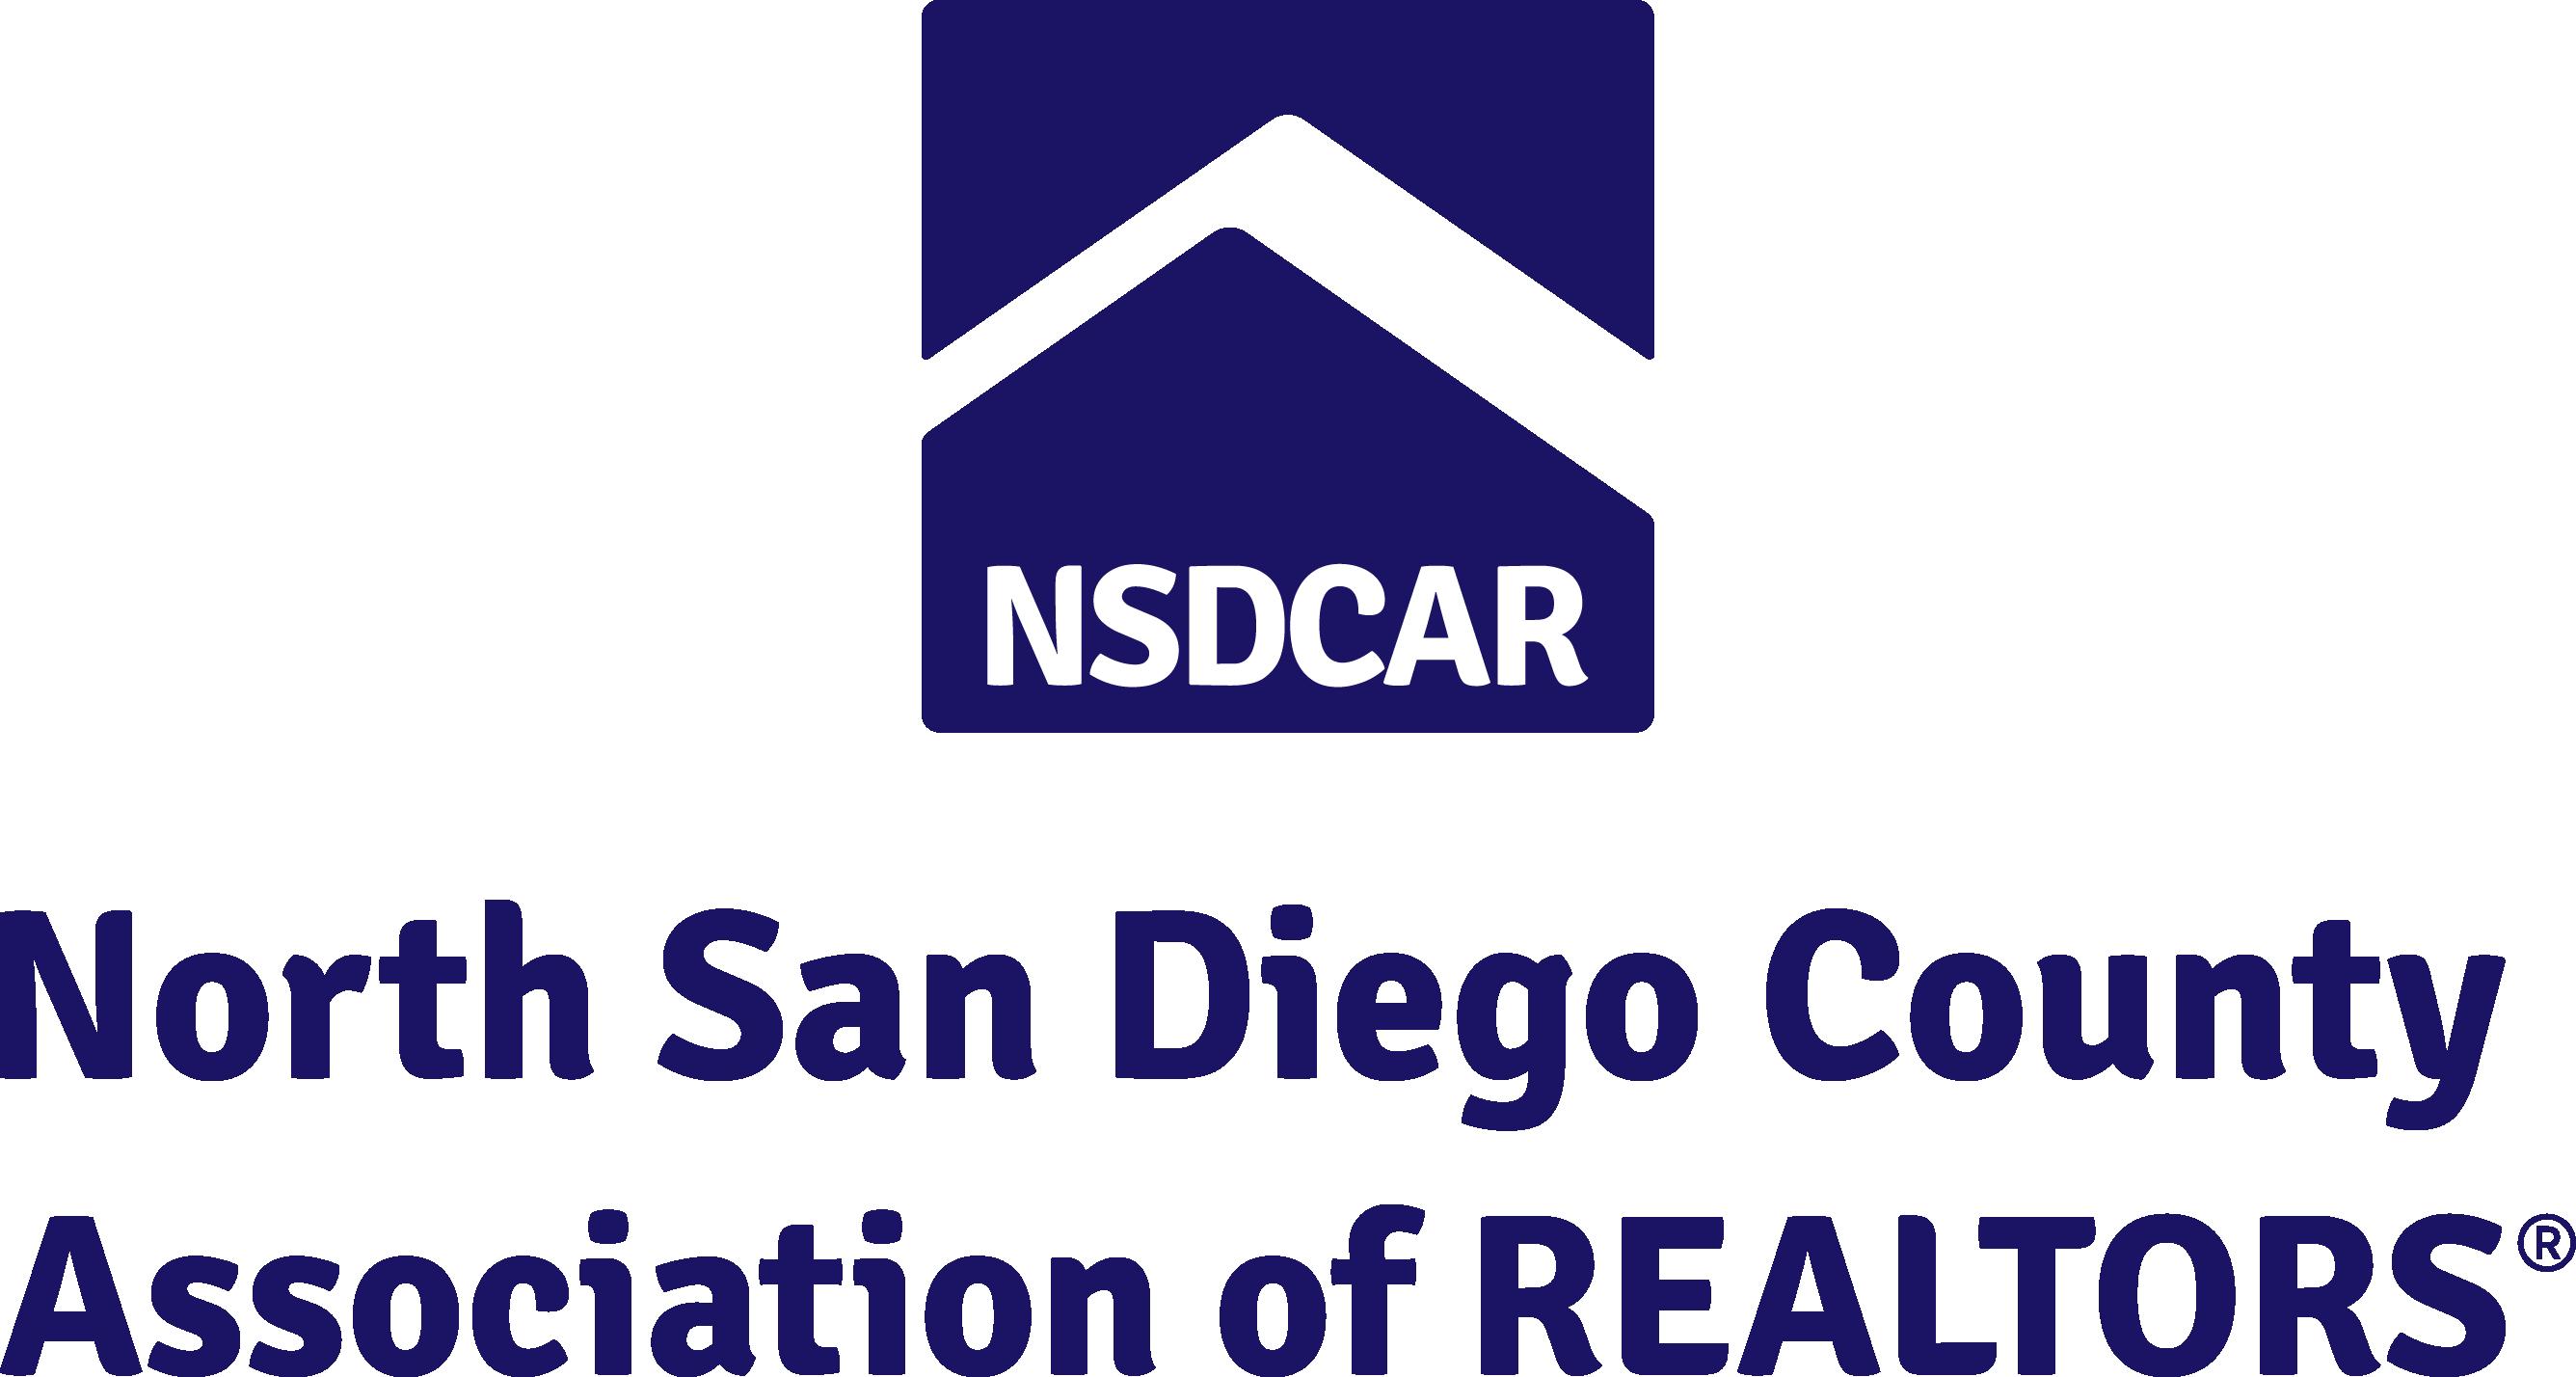 North San Diego County Association of REALTORS